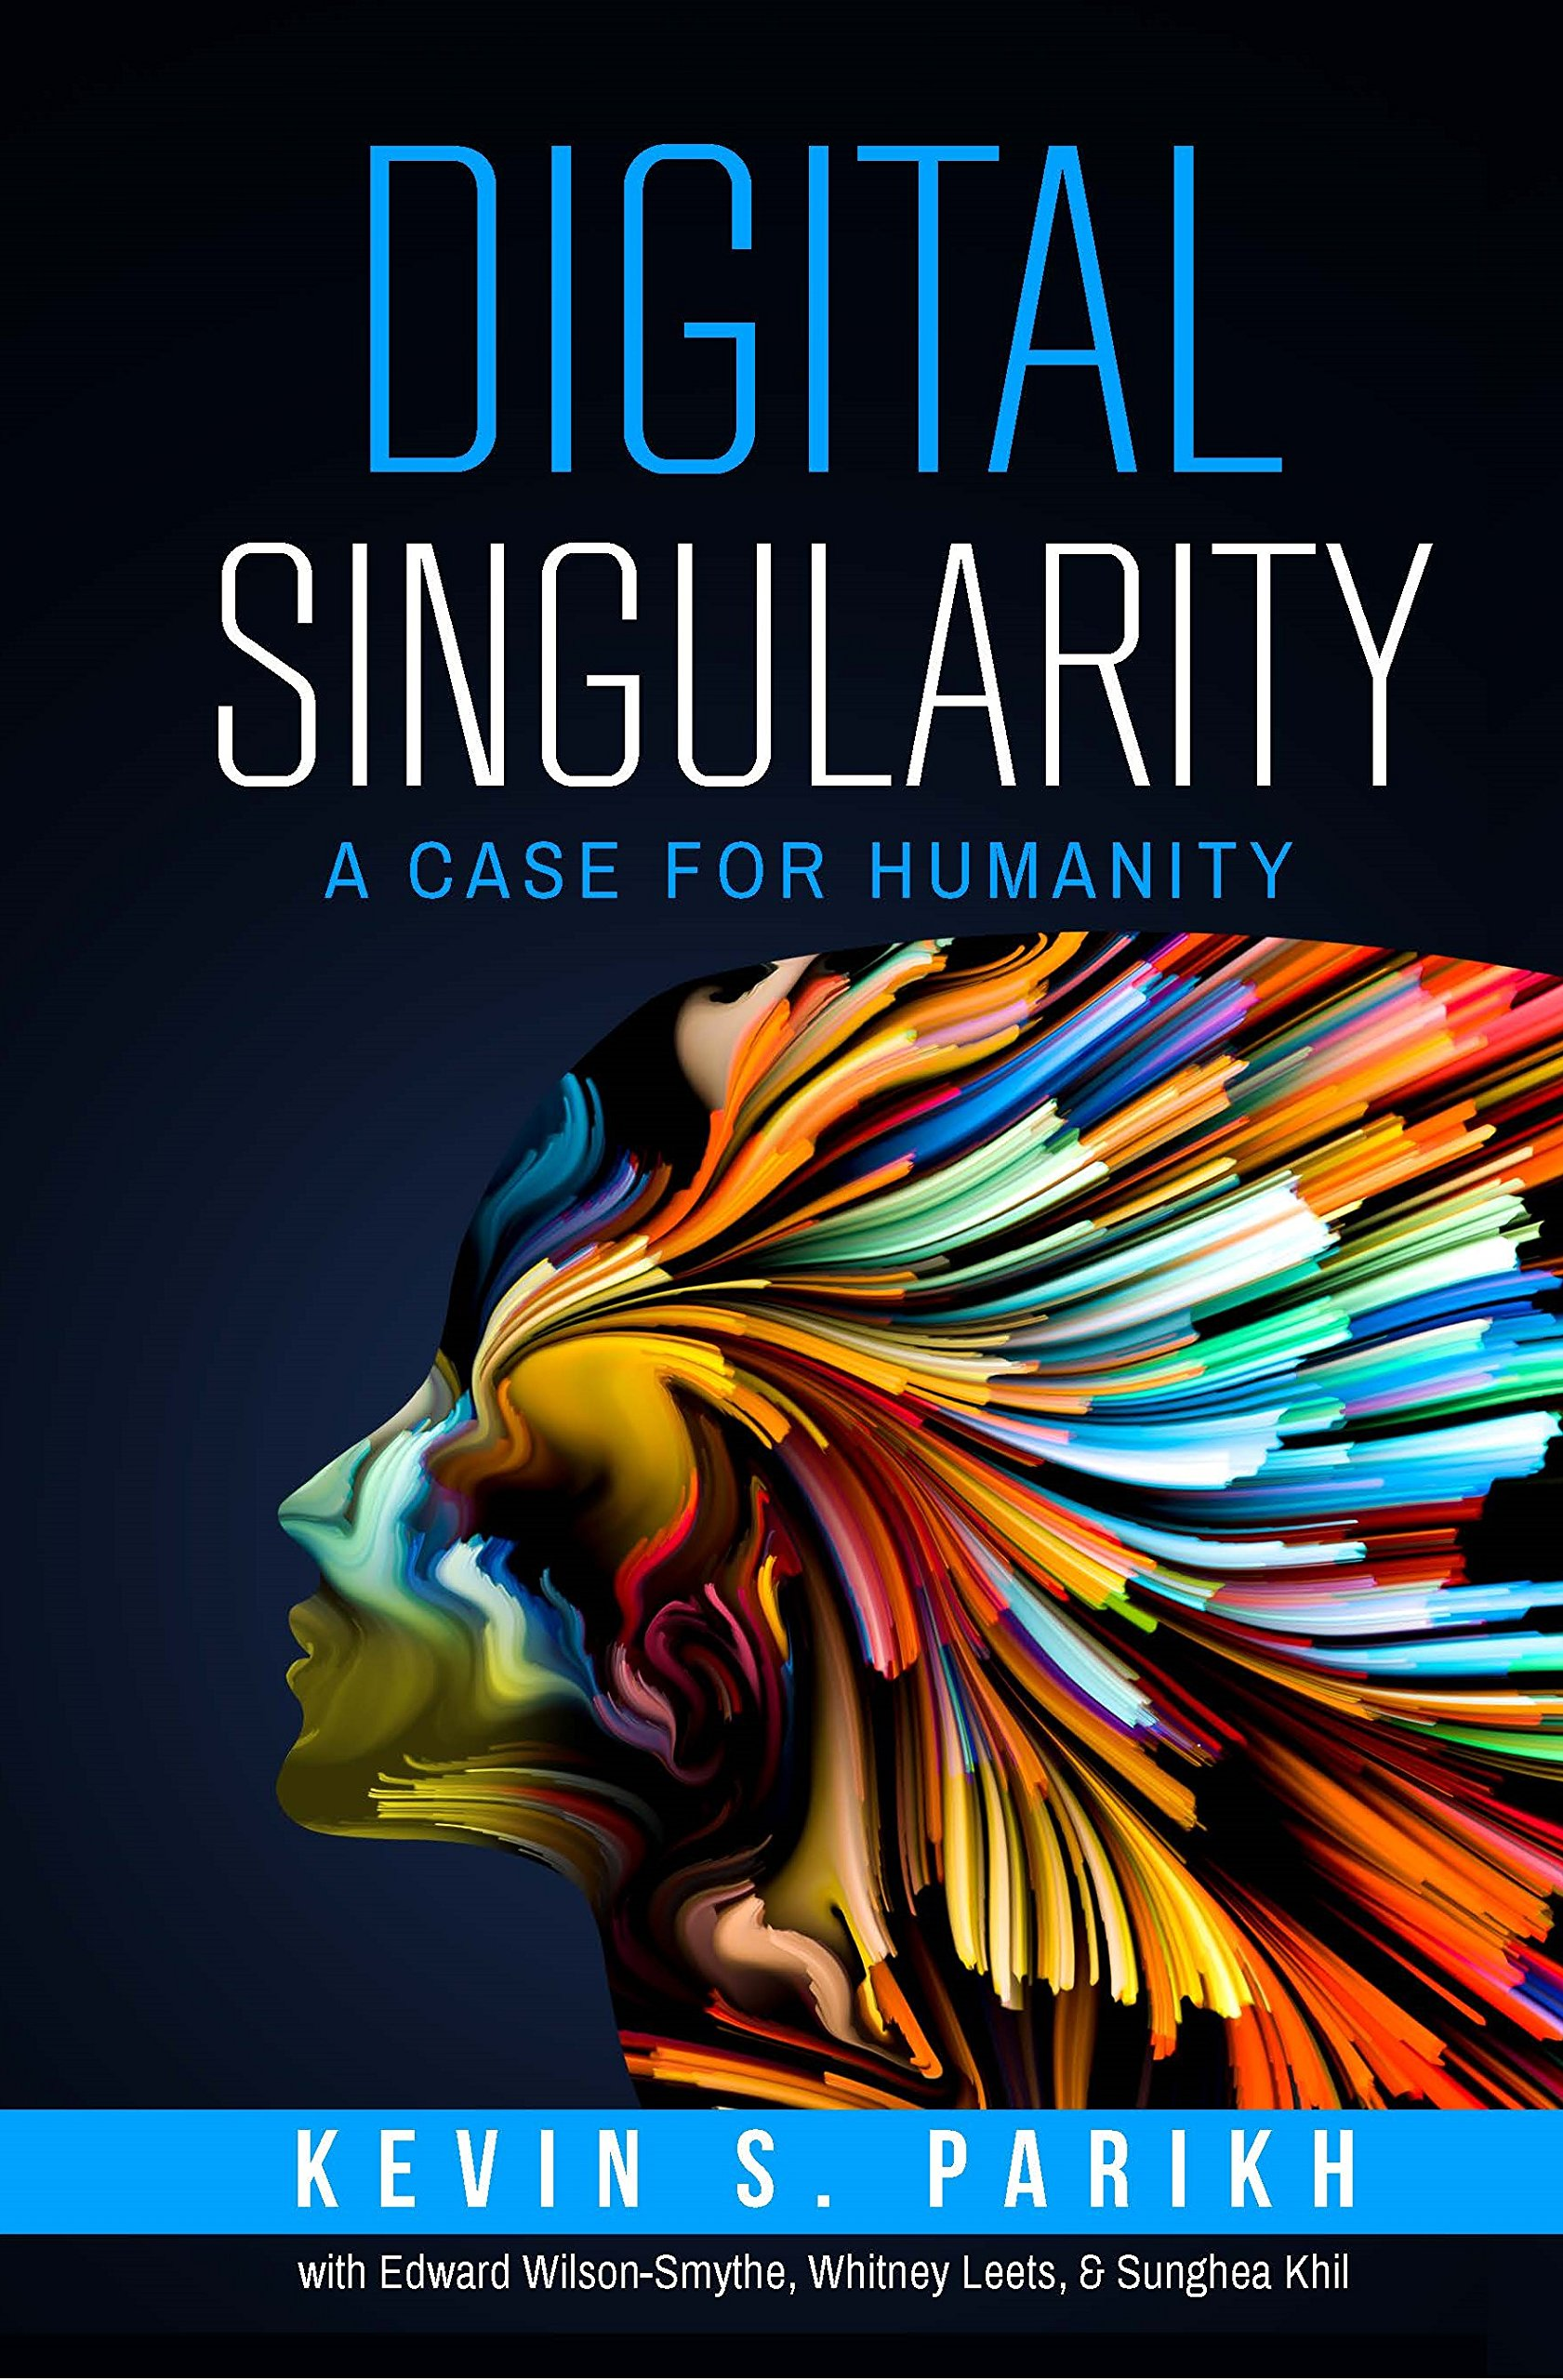 Digital Singularity: A Case for Humanity